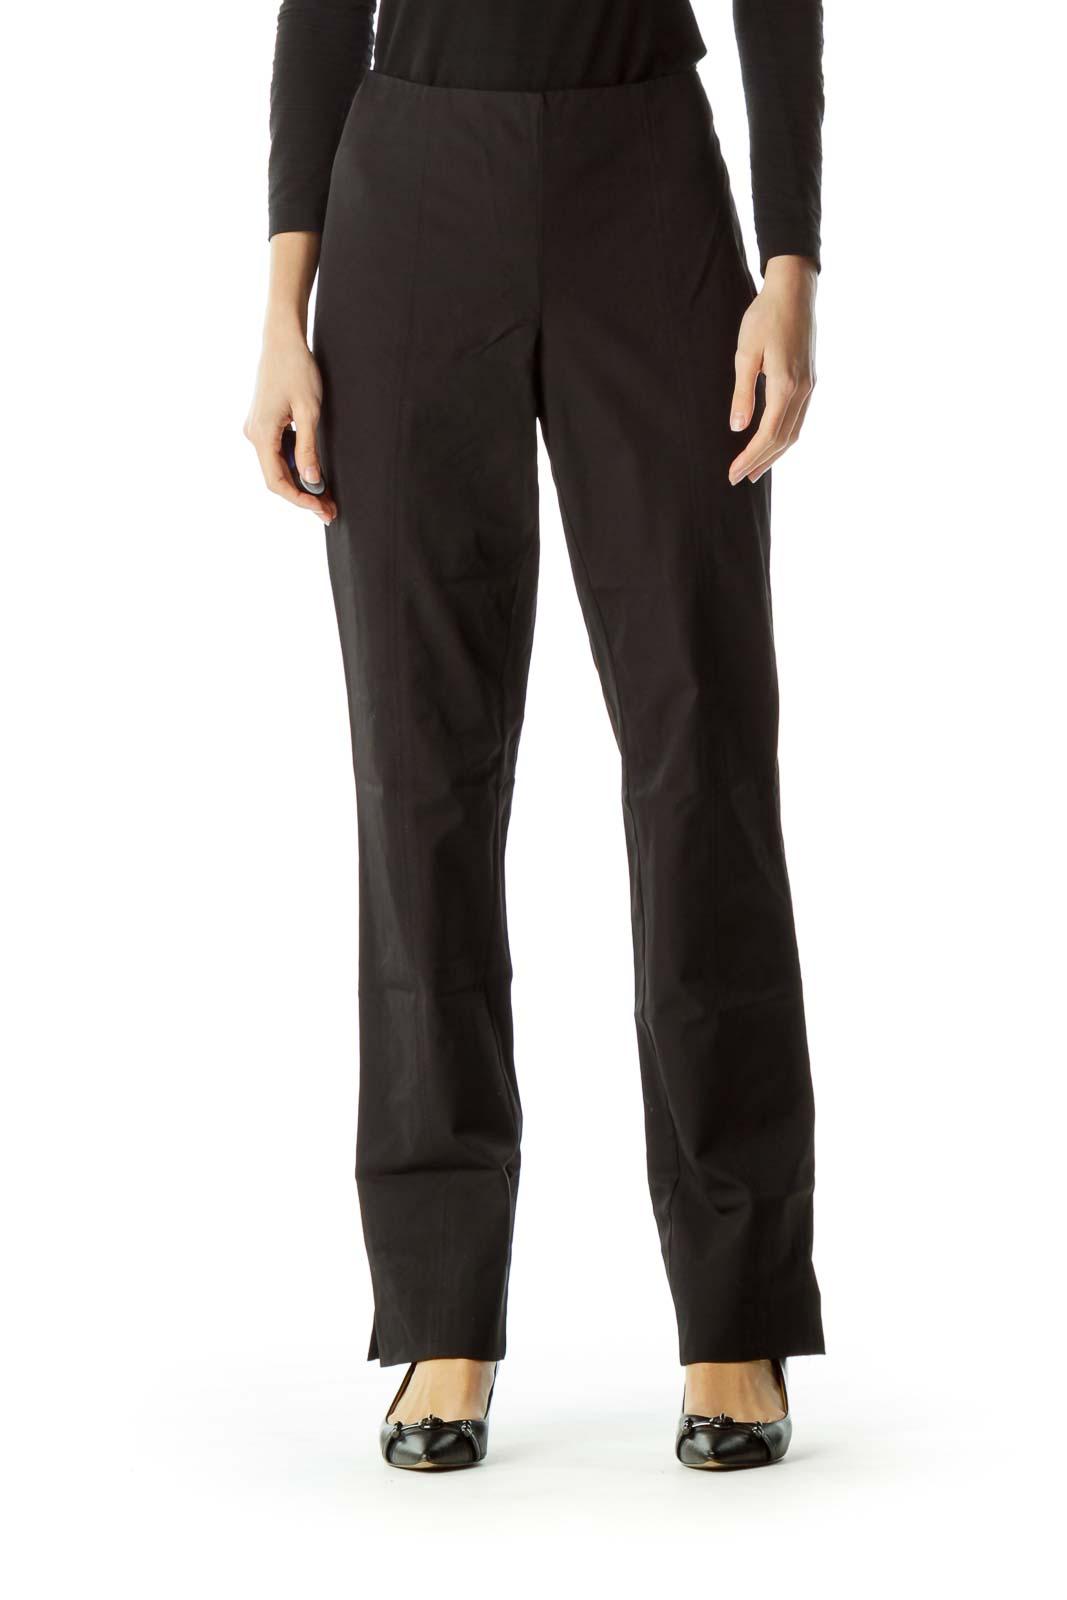 Black Stitch Detail Straight Leg Pants Front